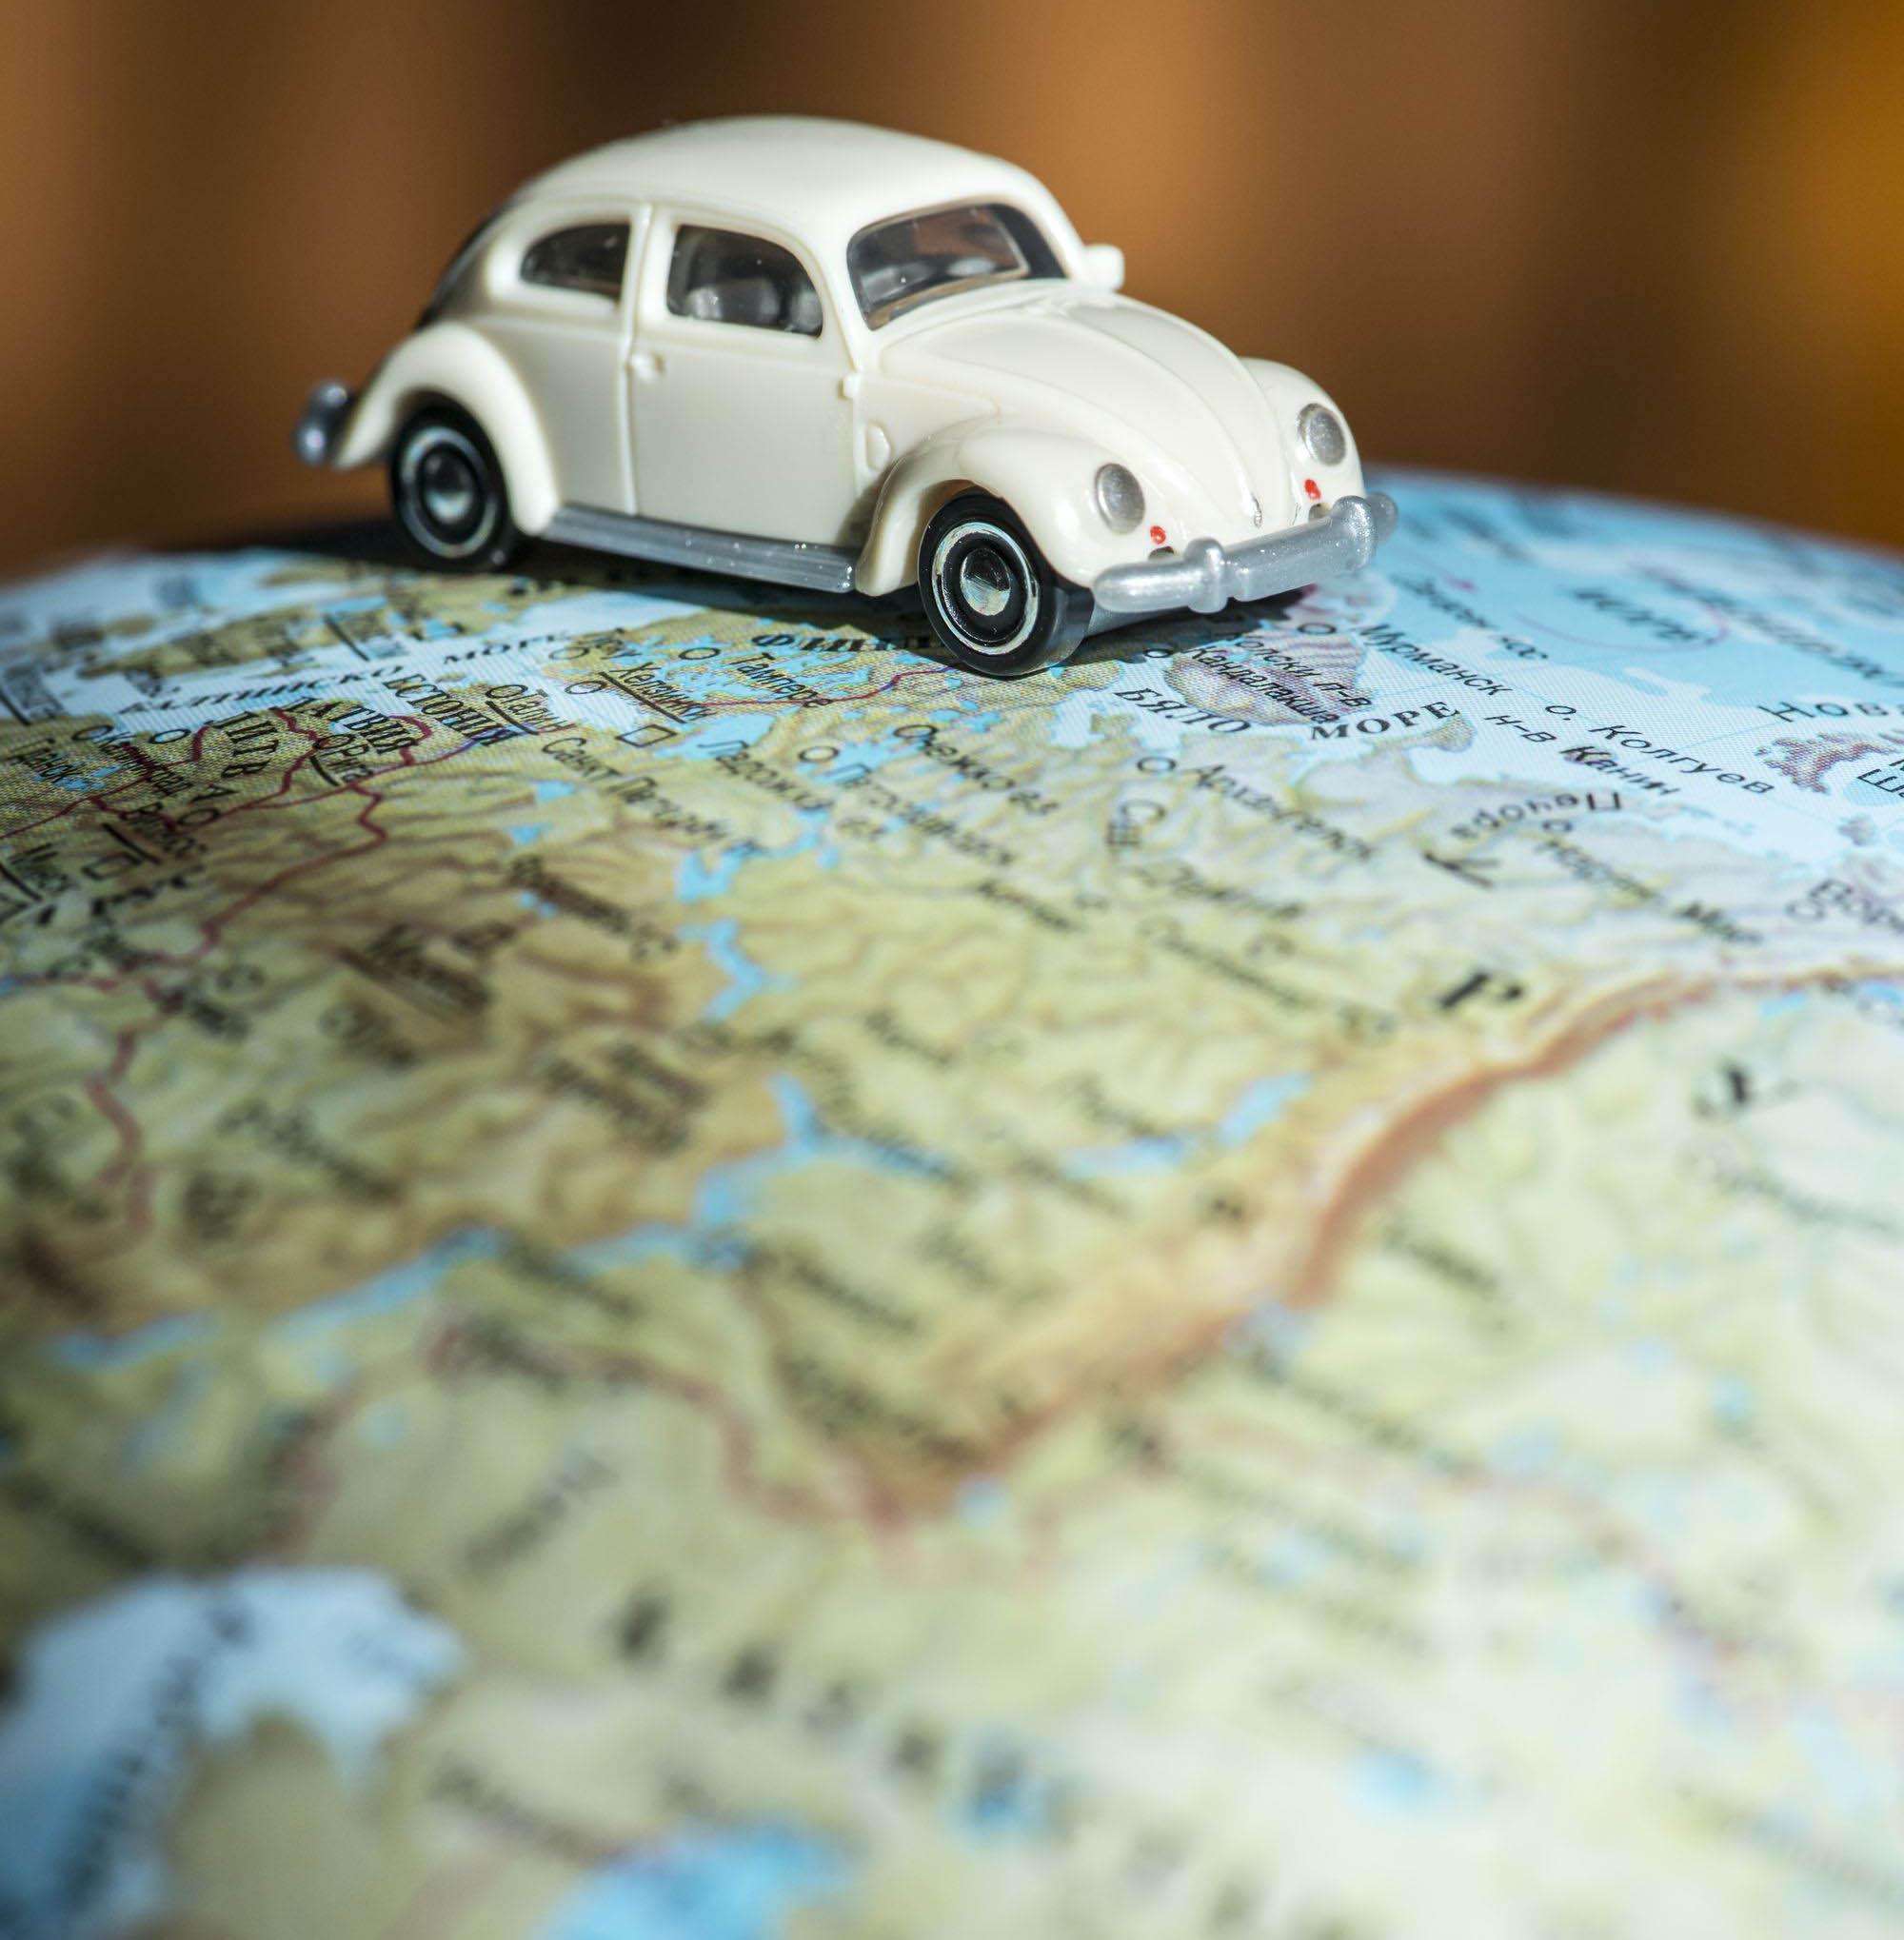 Car figure on globe. Miniature car toy